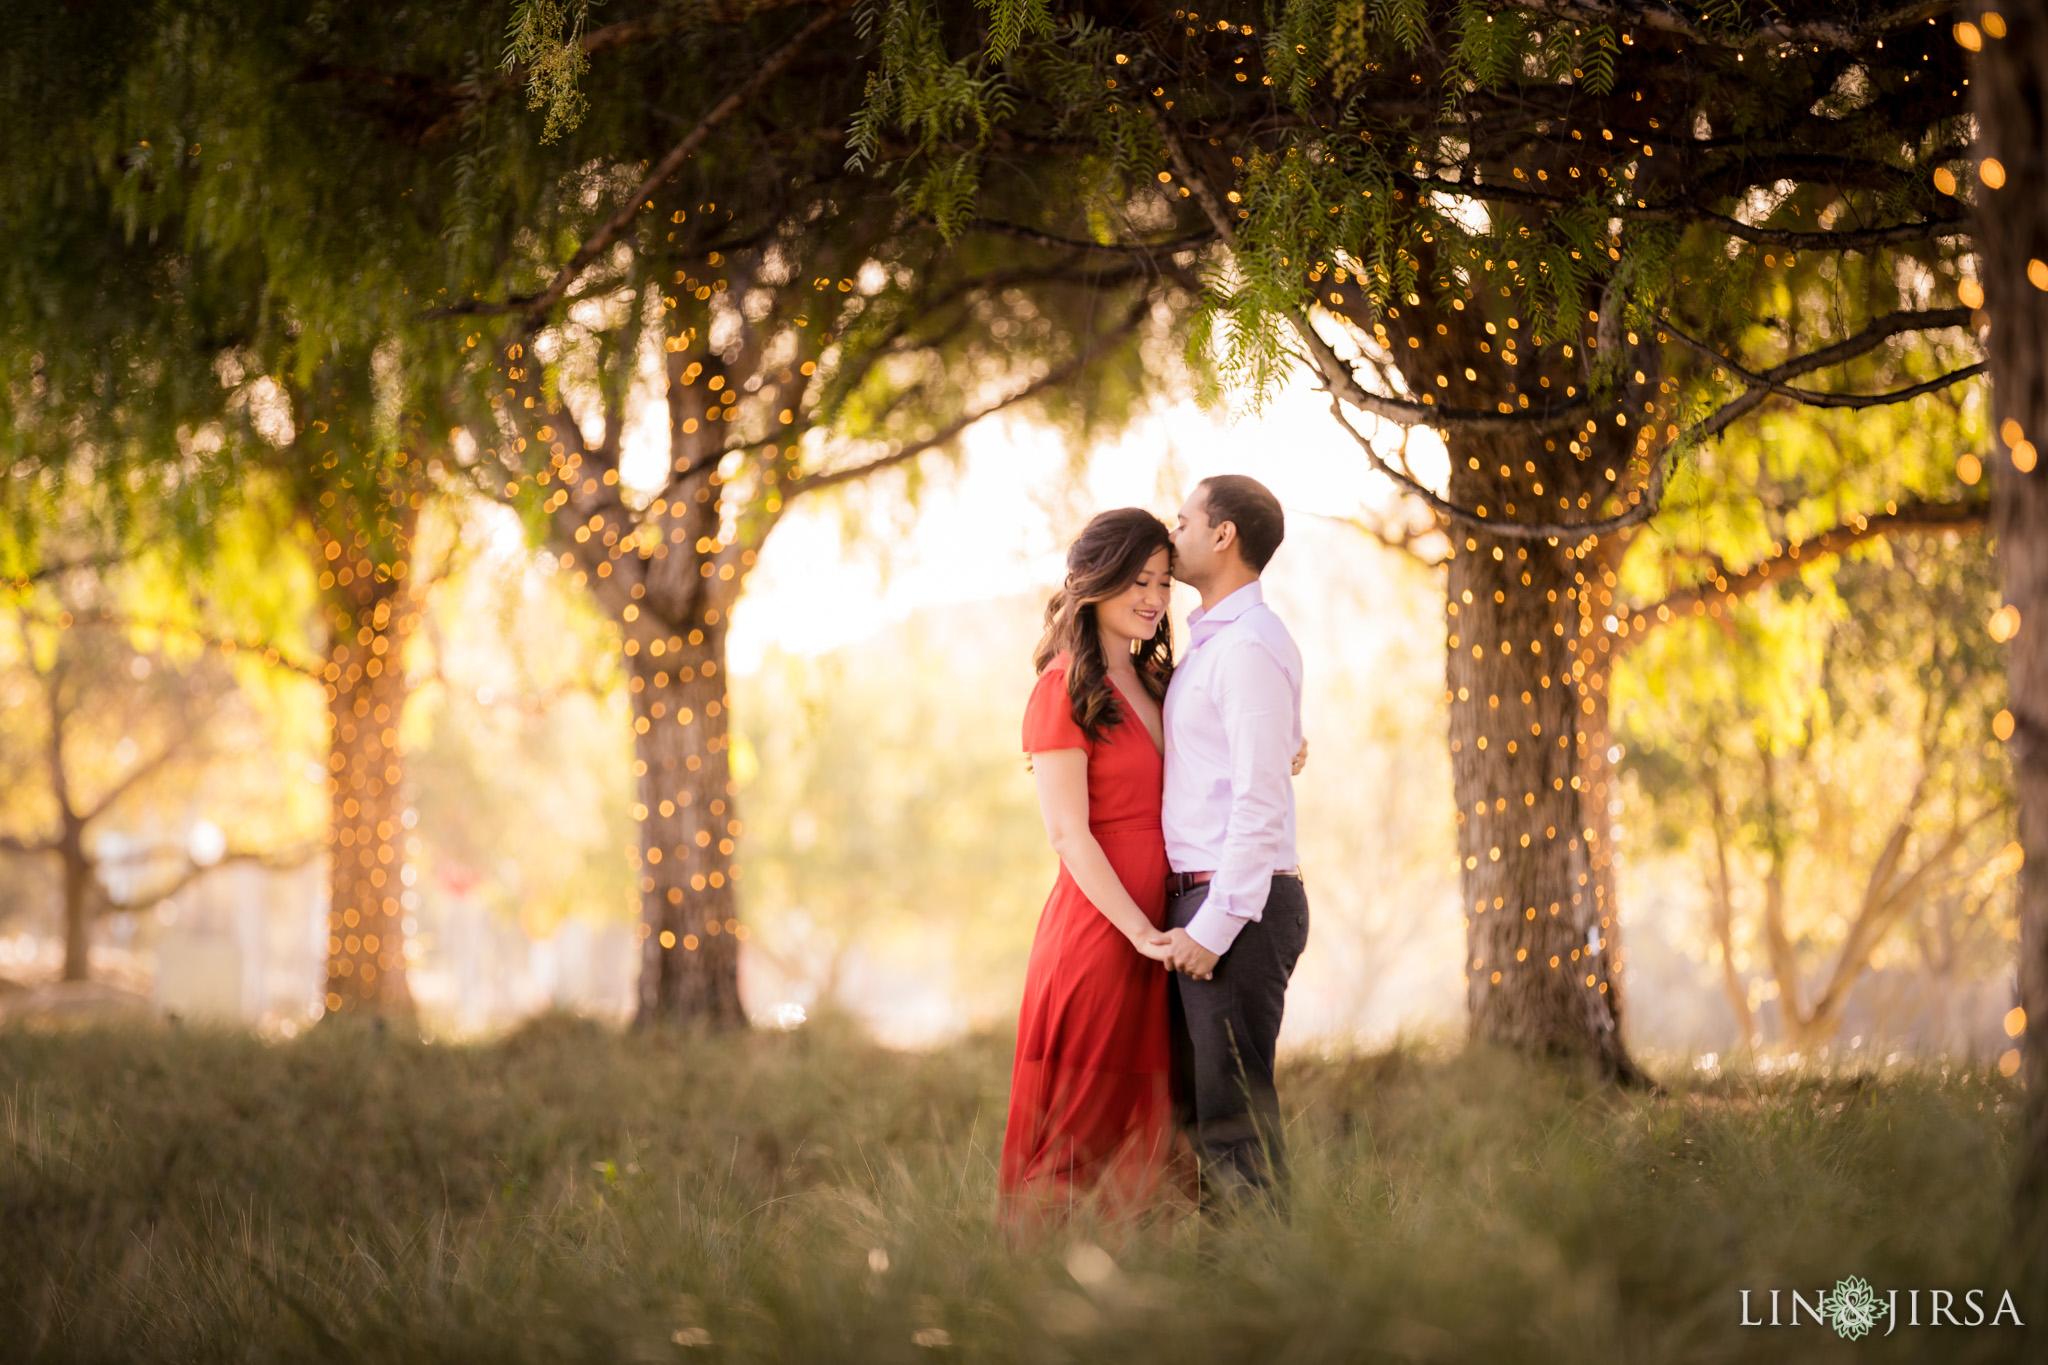 quail hill engagement lin and jirsa photography